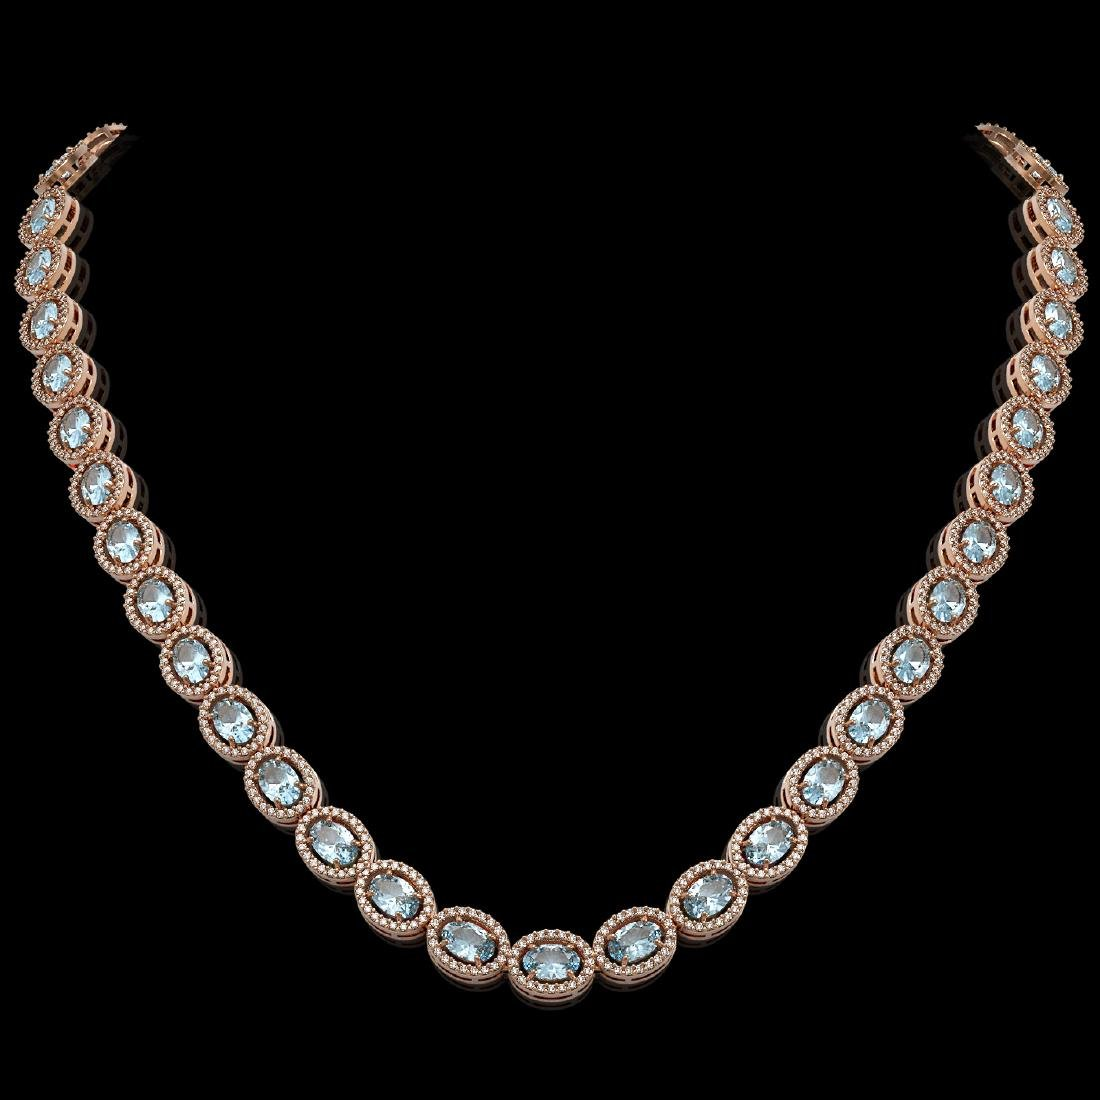 33.25 CTW Sky Topaz & Diamond Halo Necklace 10K Rose